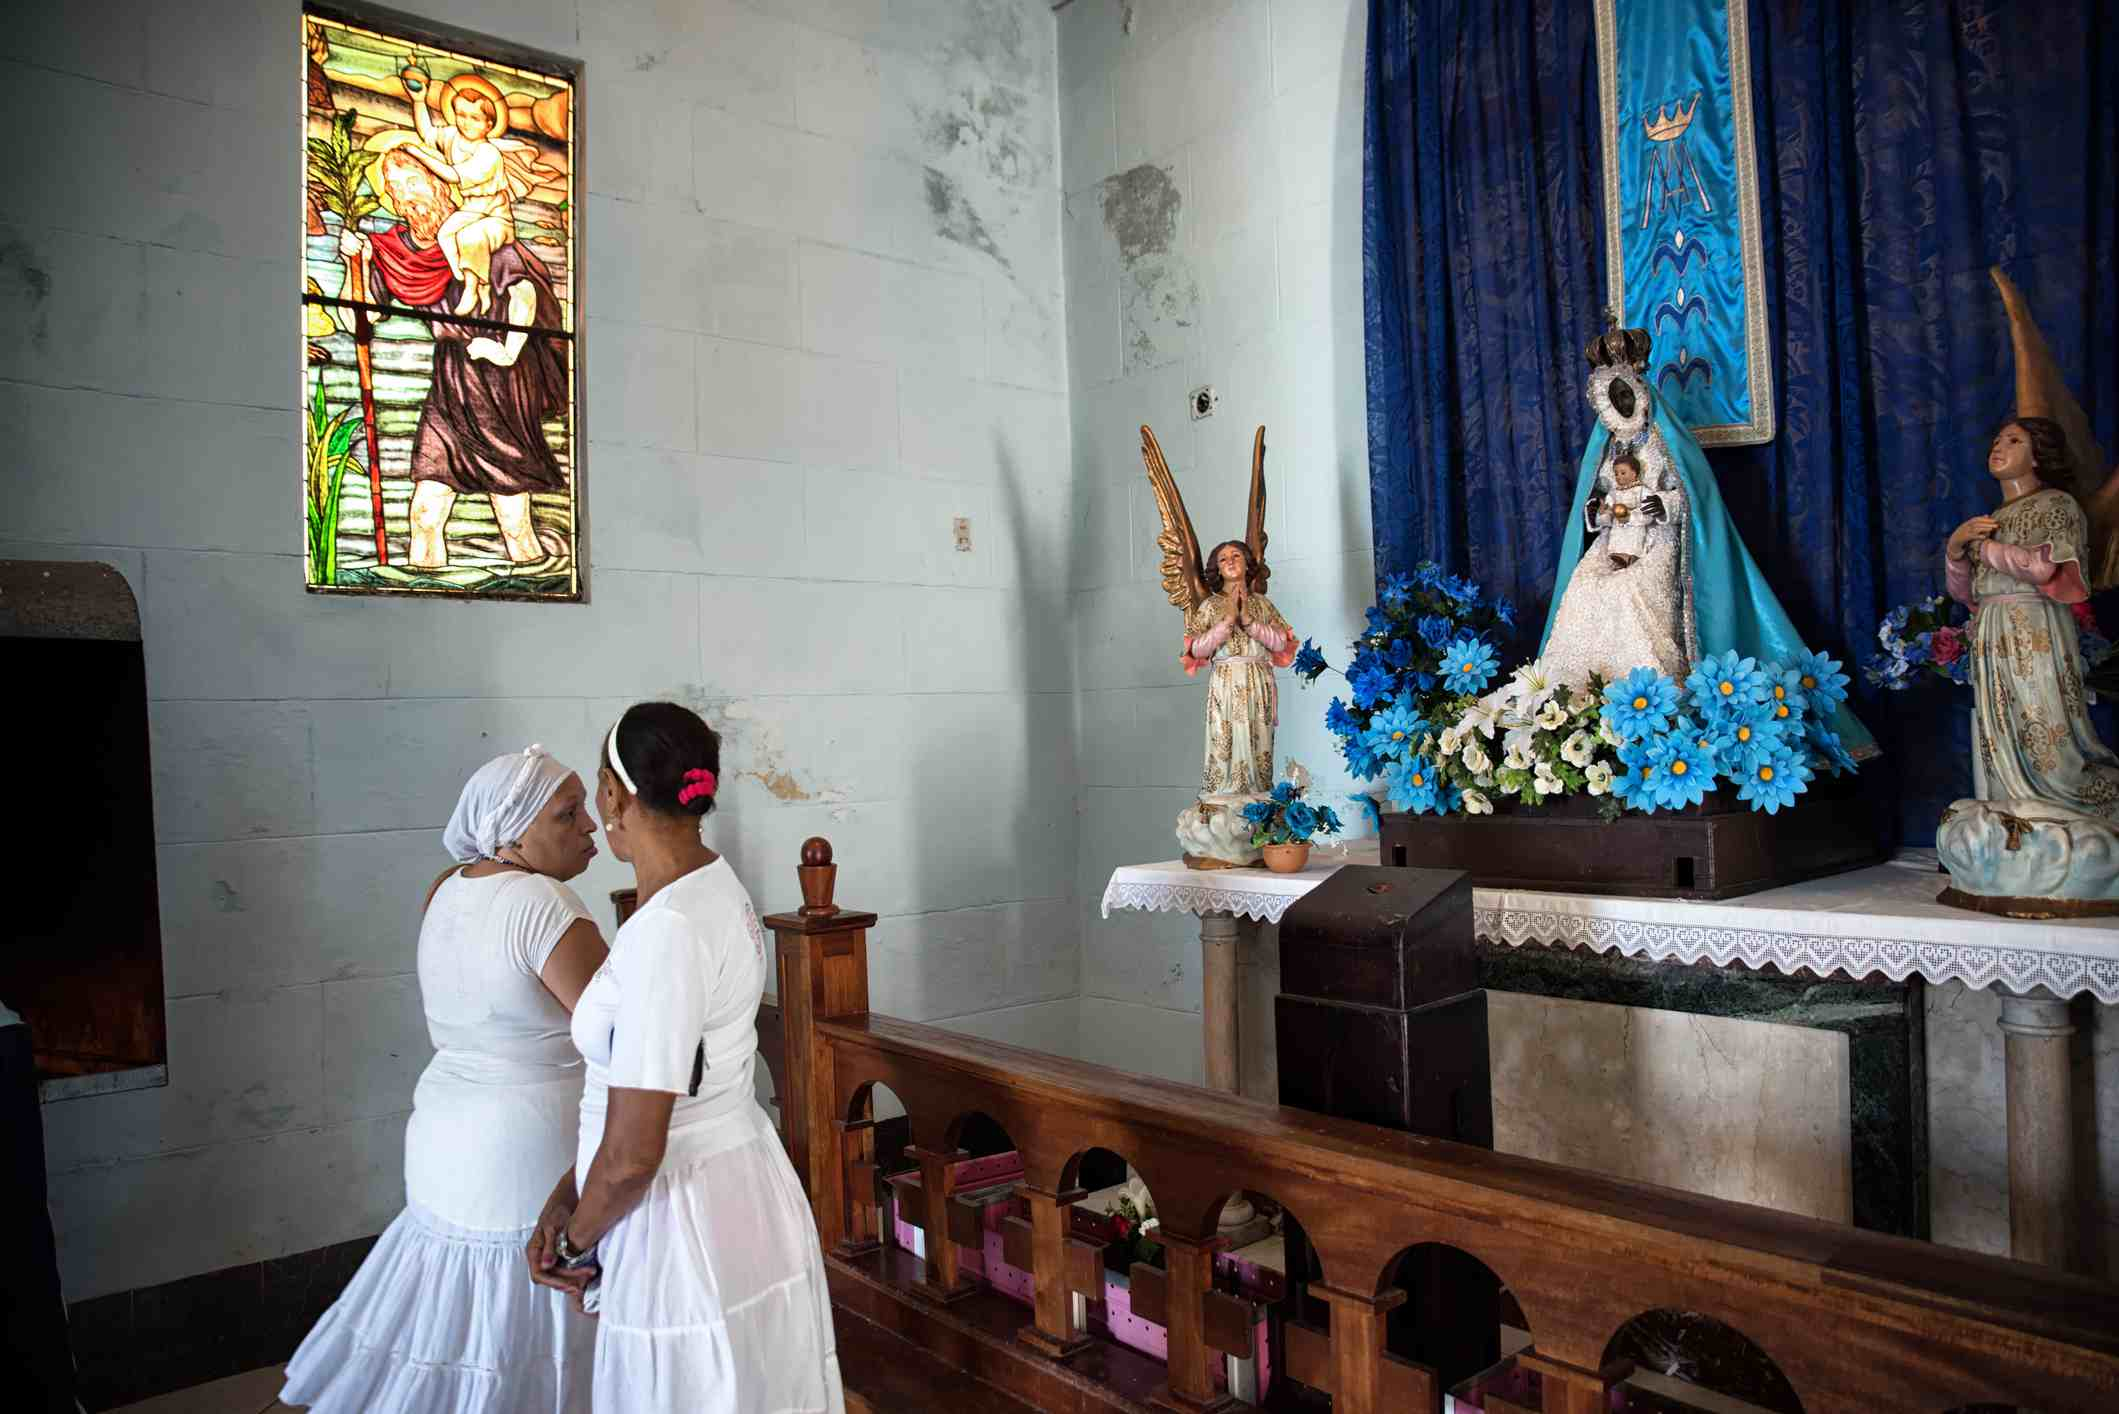 Santeria women in the Our Lady of the Regla church, in Havana, Cuba